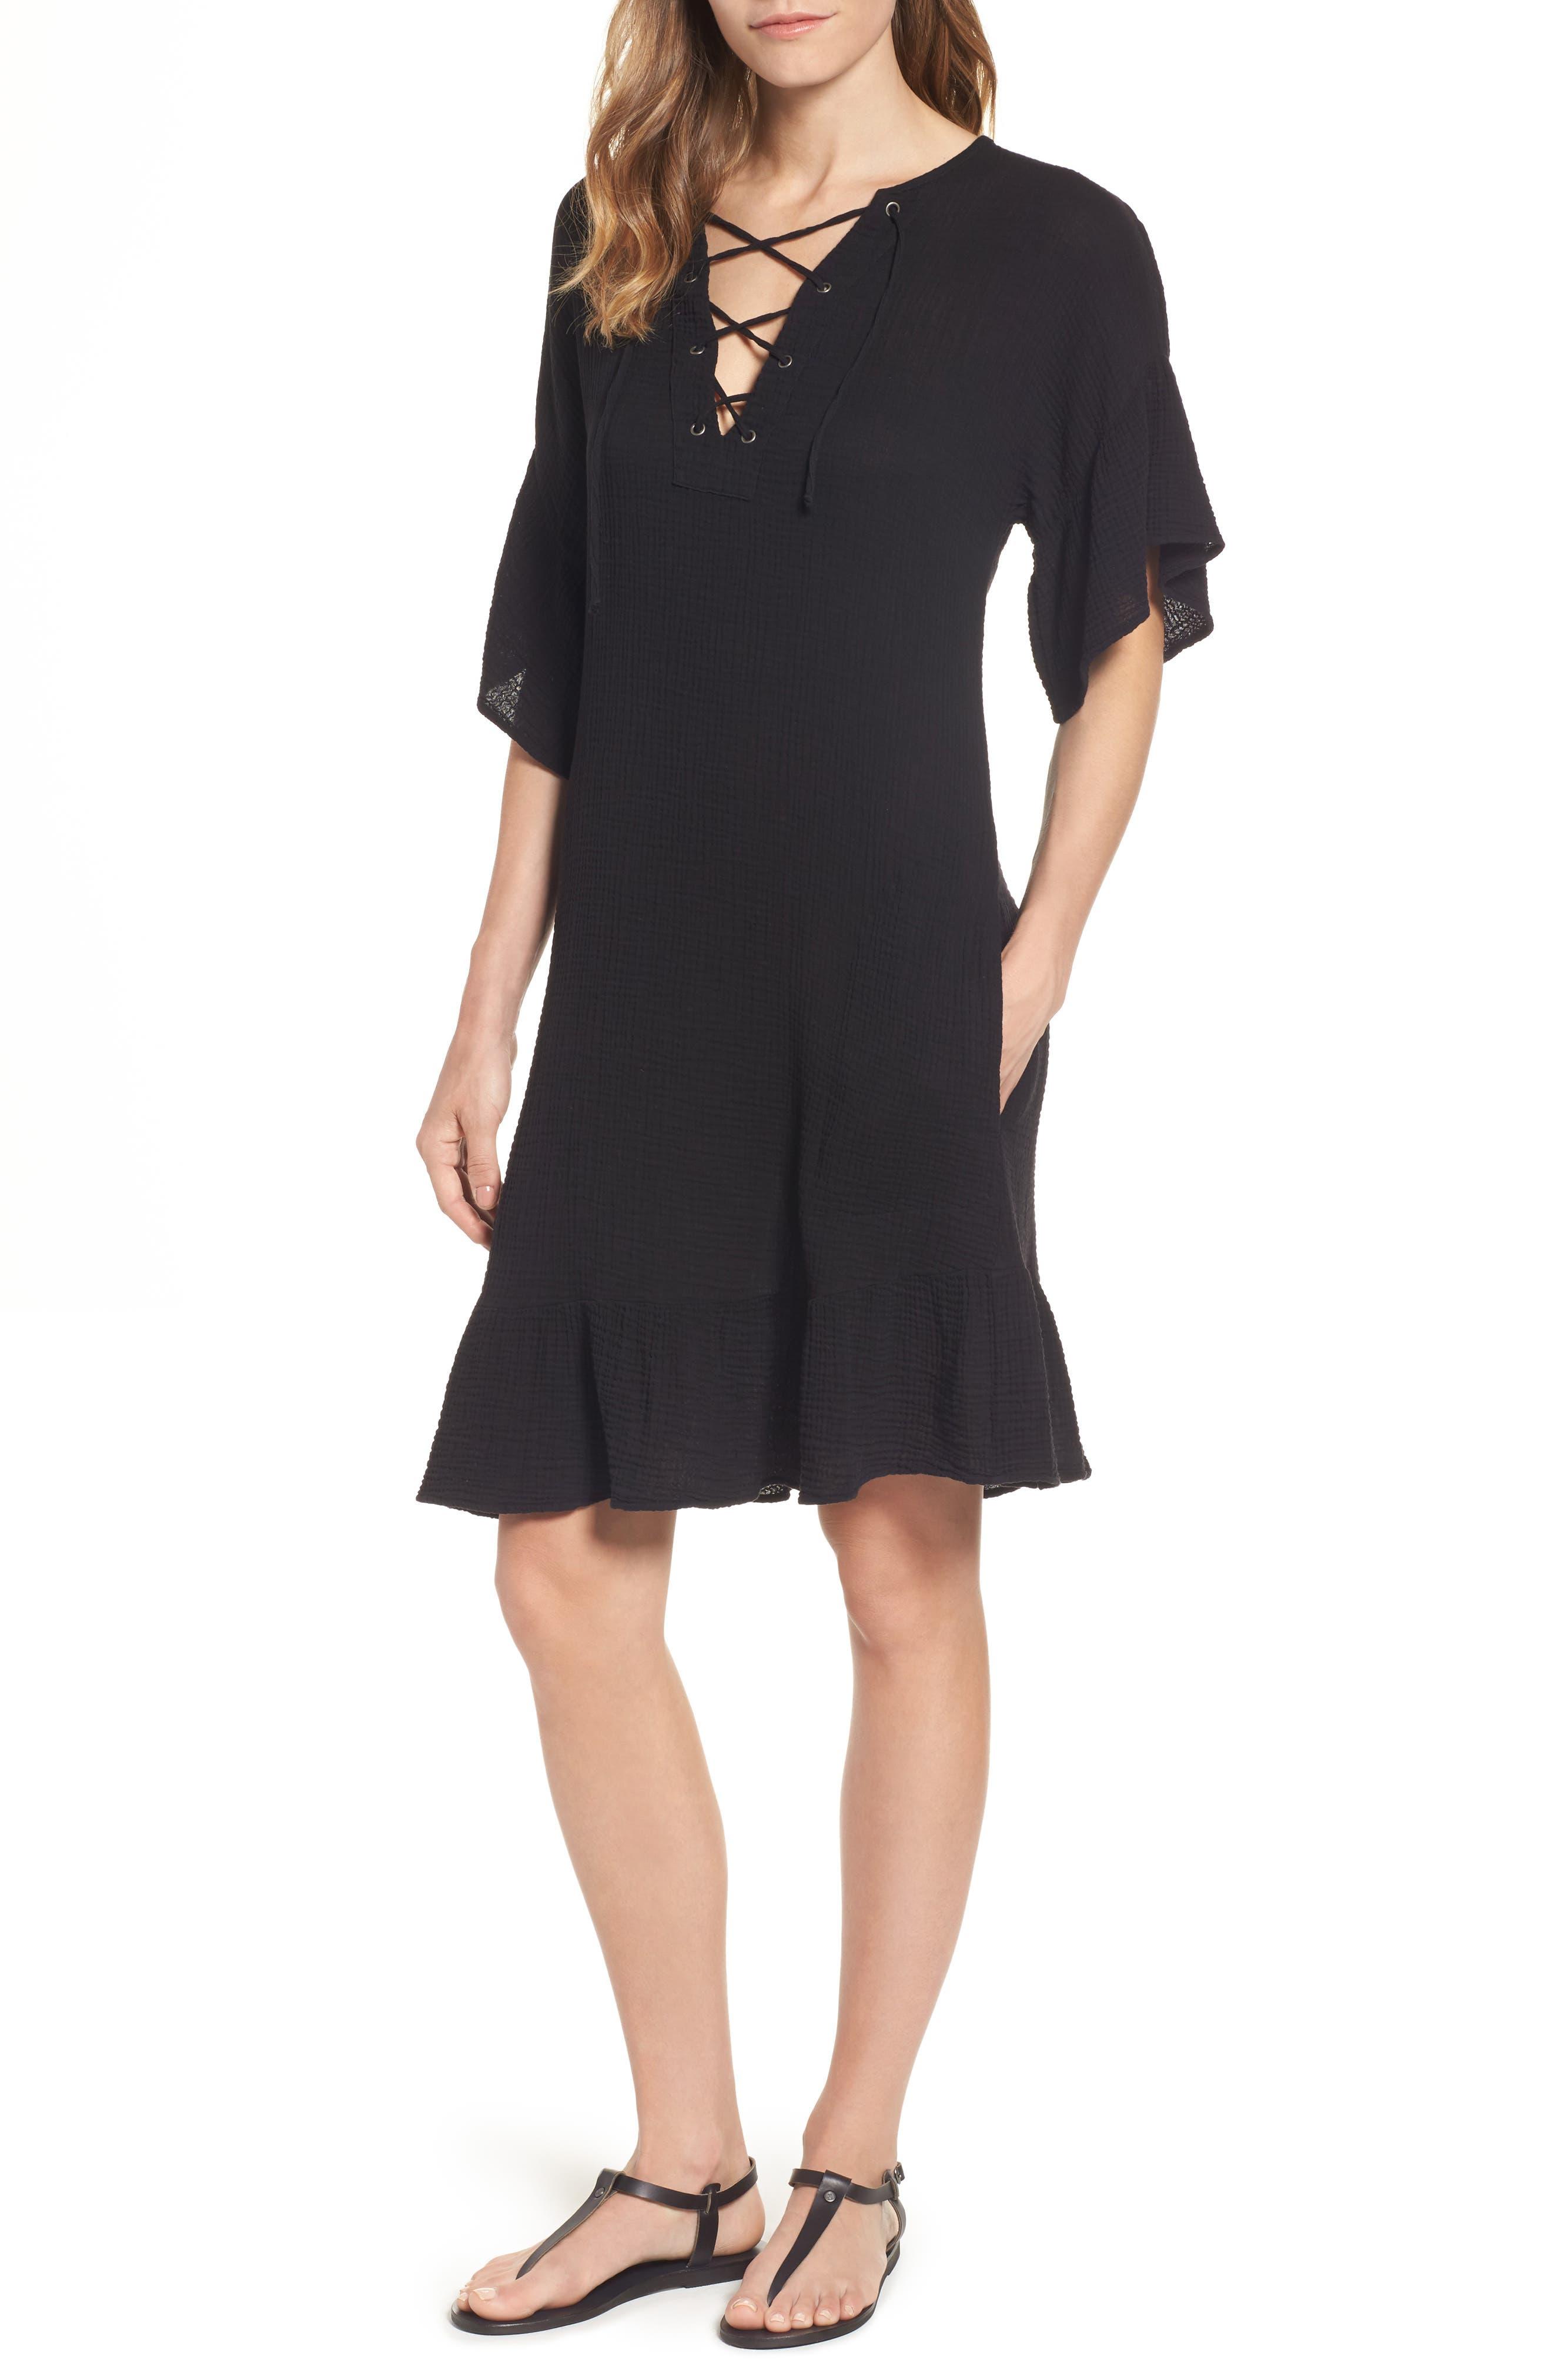 VELVET BY GRAHAM & SPENCER Lace-Up A-Line Dress